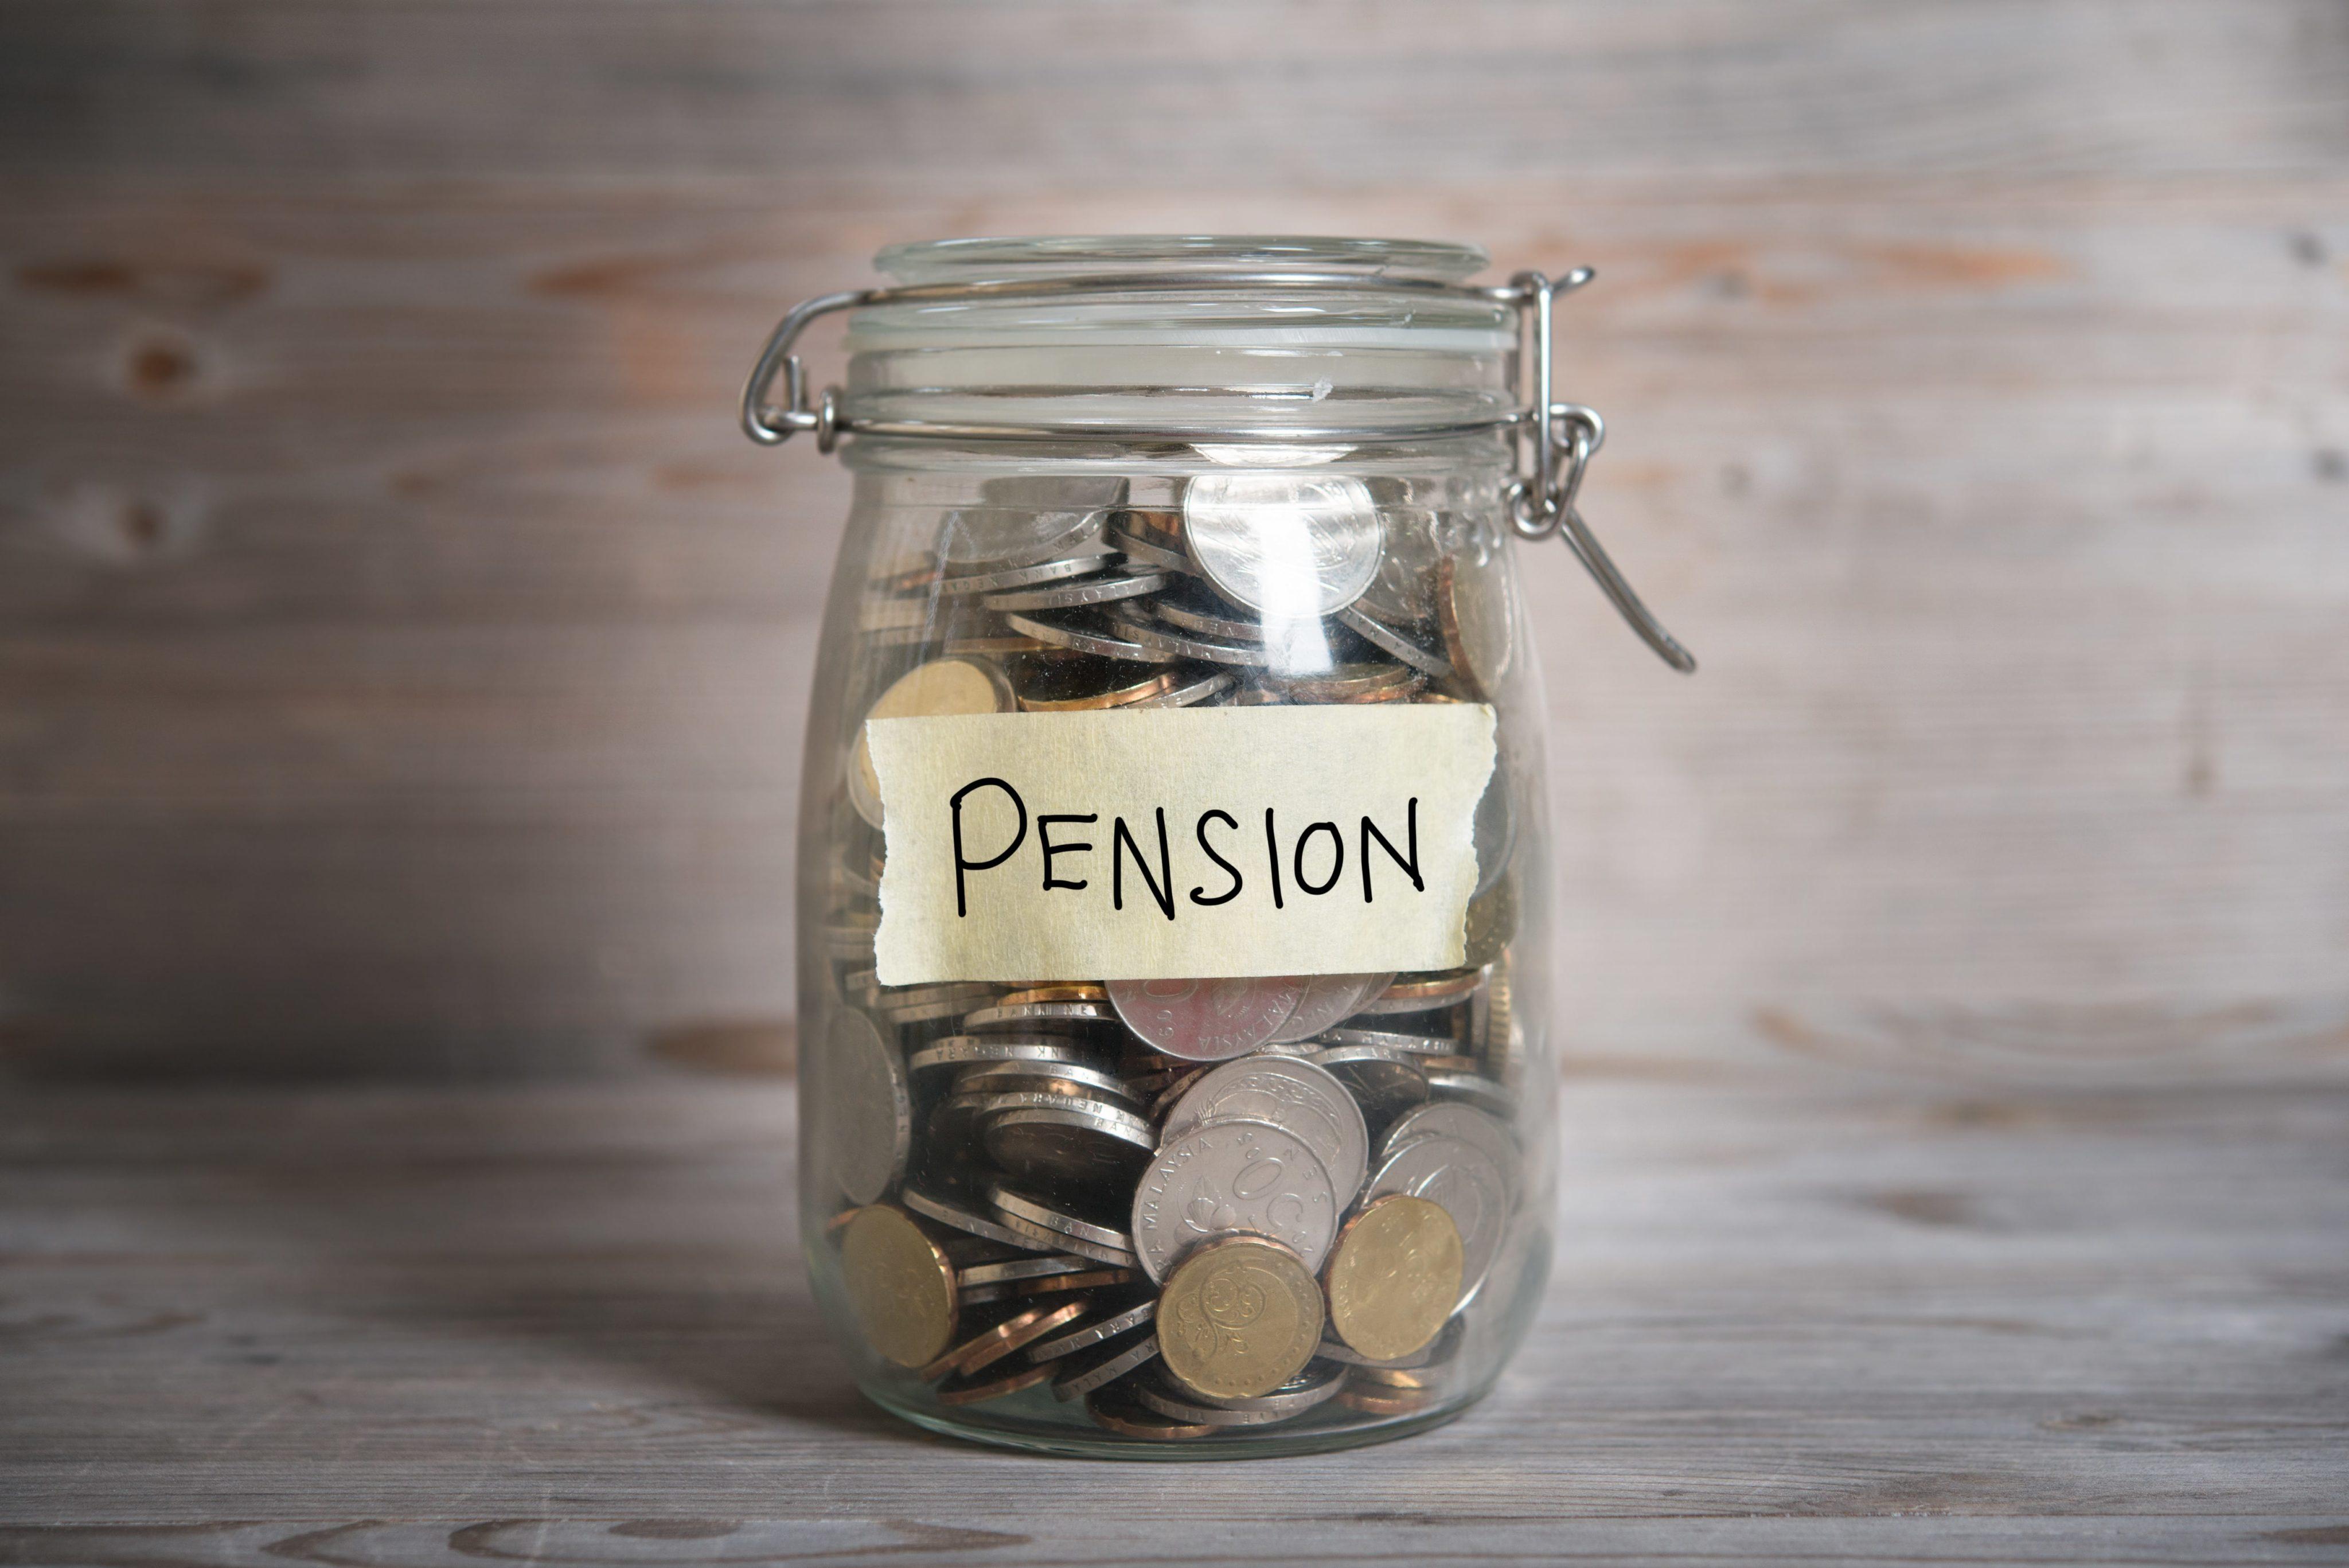 виды страховых пенсий